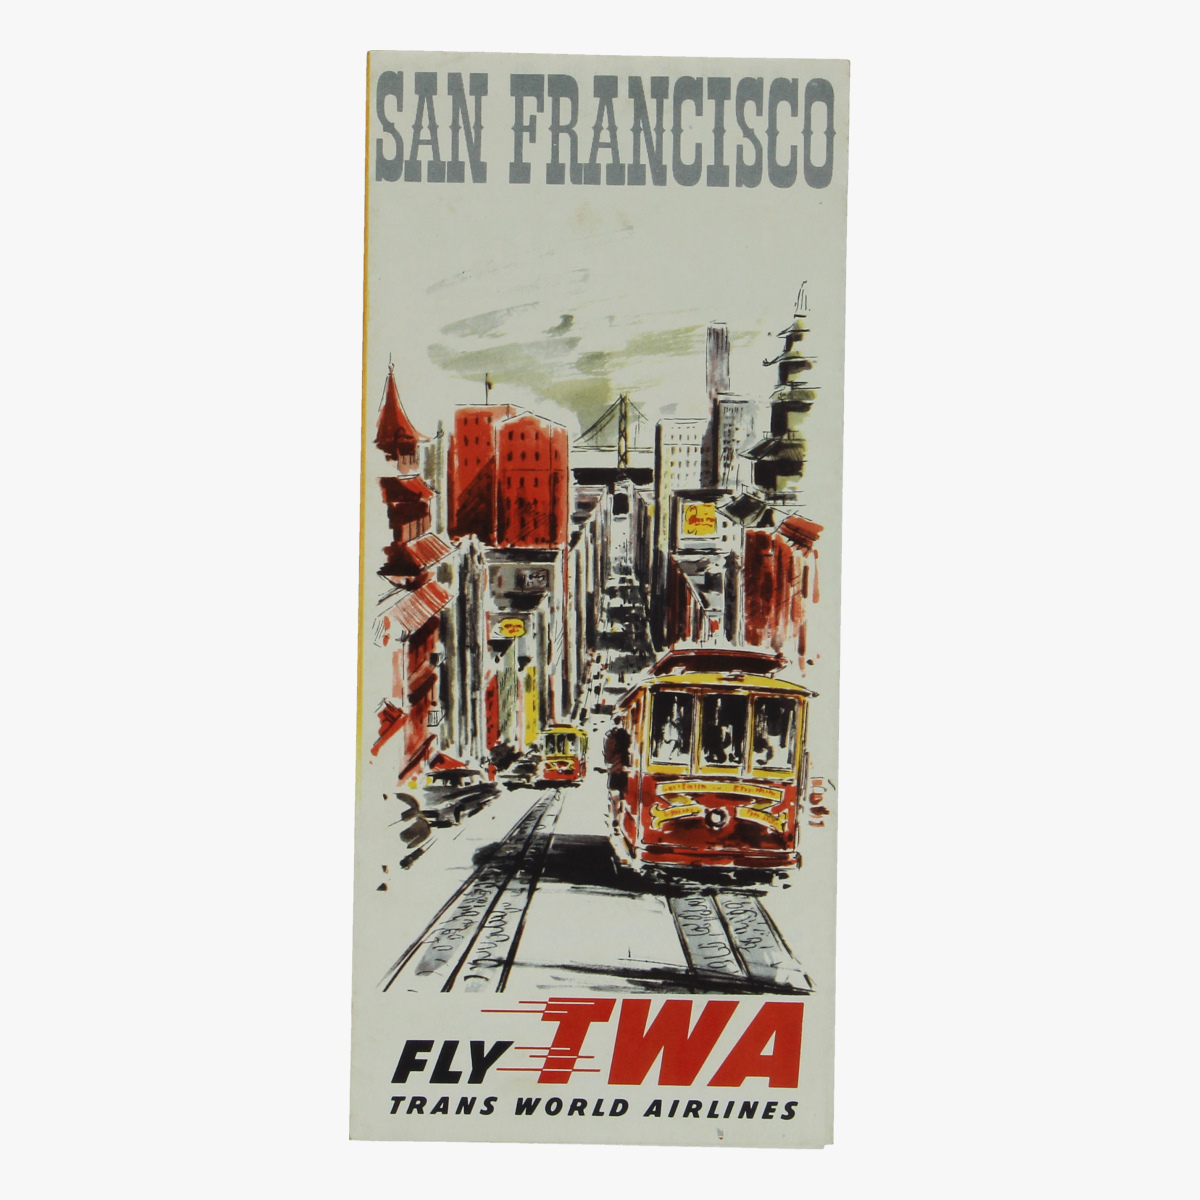 Afbeeldingen van folder fly trans world airlines - twa - san francisco